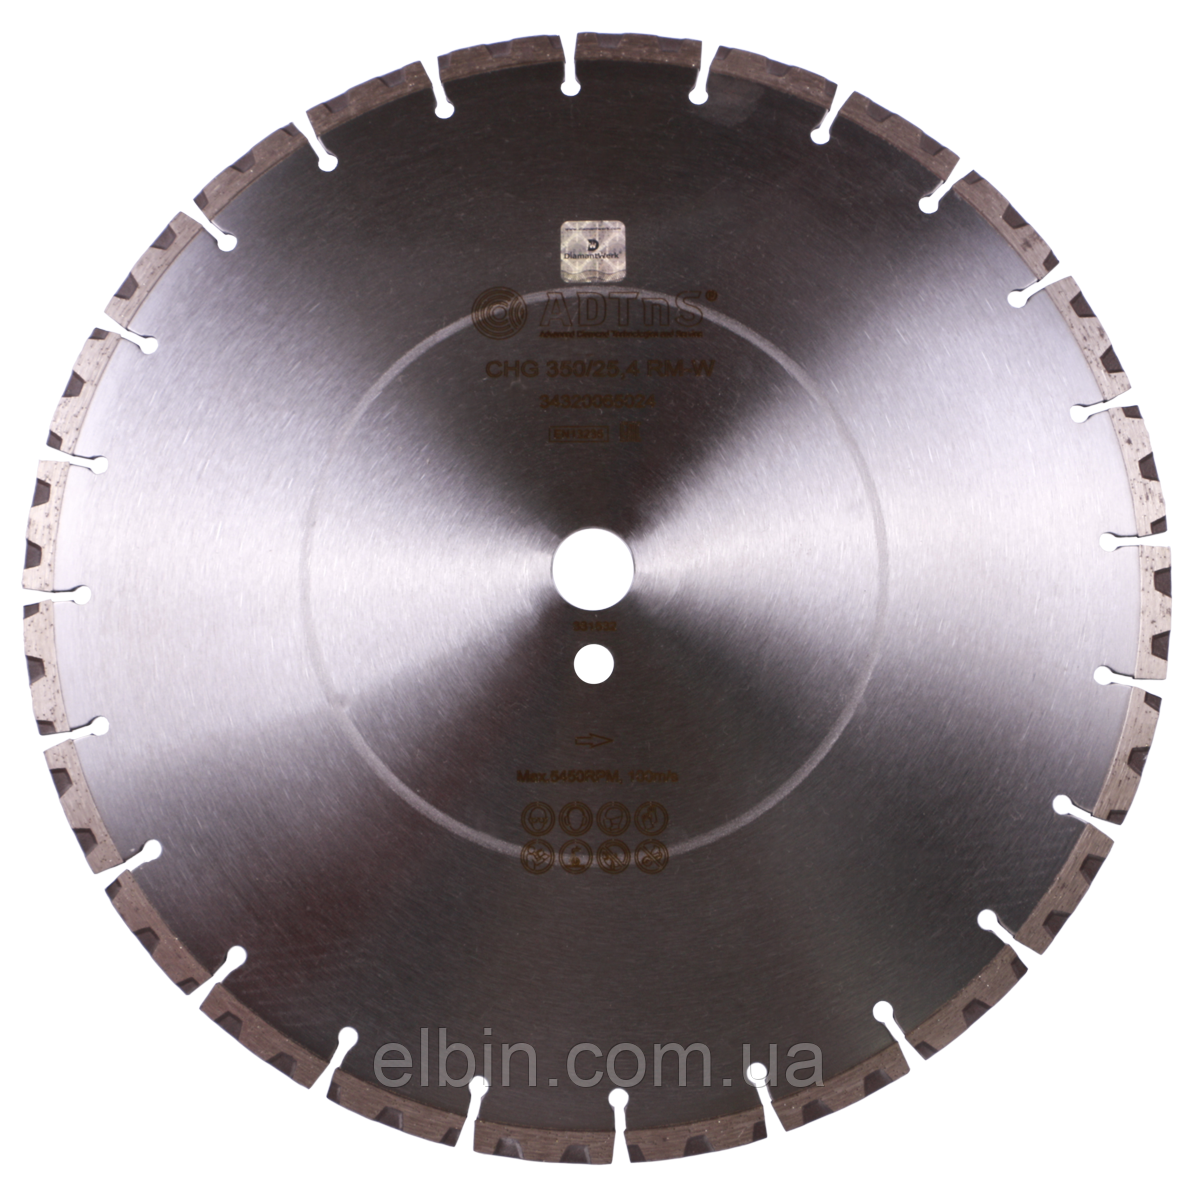 Круг алмазный отрезной ADTnS 1A1RSS/C3-H 350x3,5/2,5x10x25,4-24 F4 CHG 350/25,4 RM-W